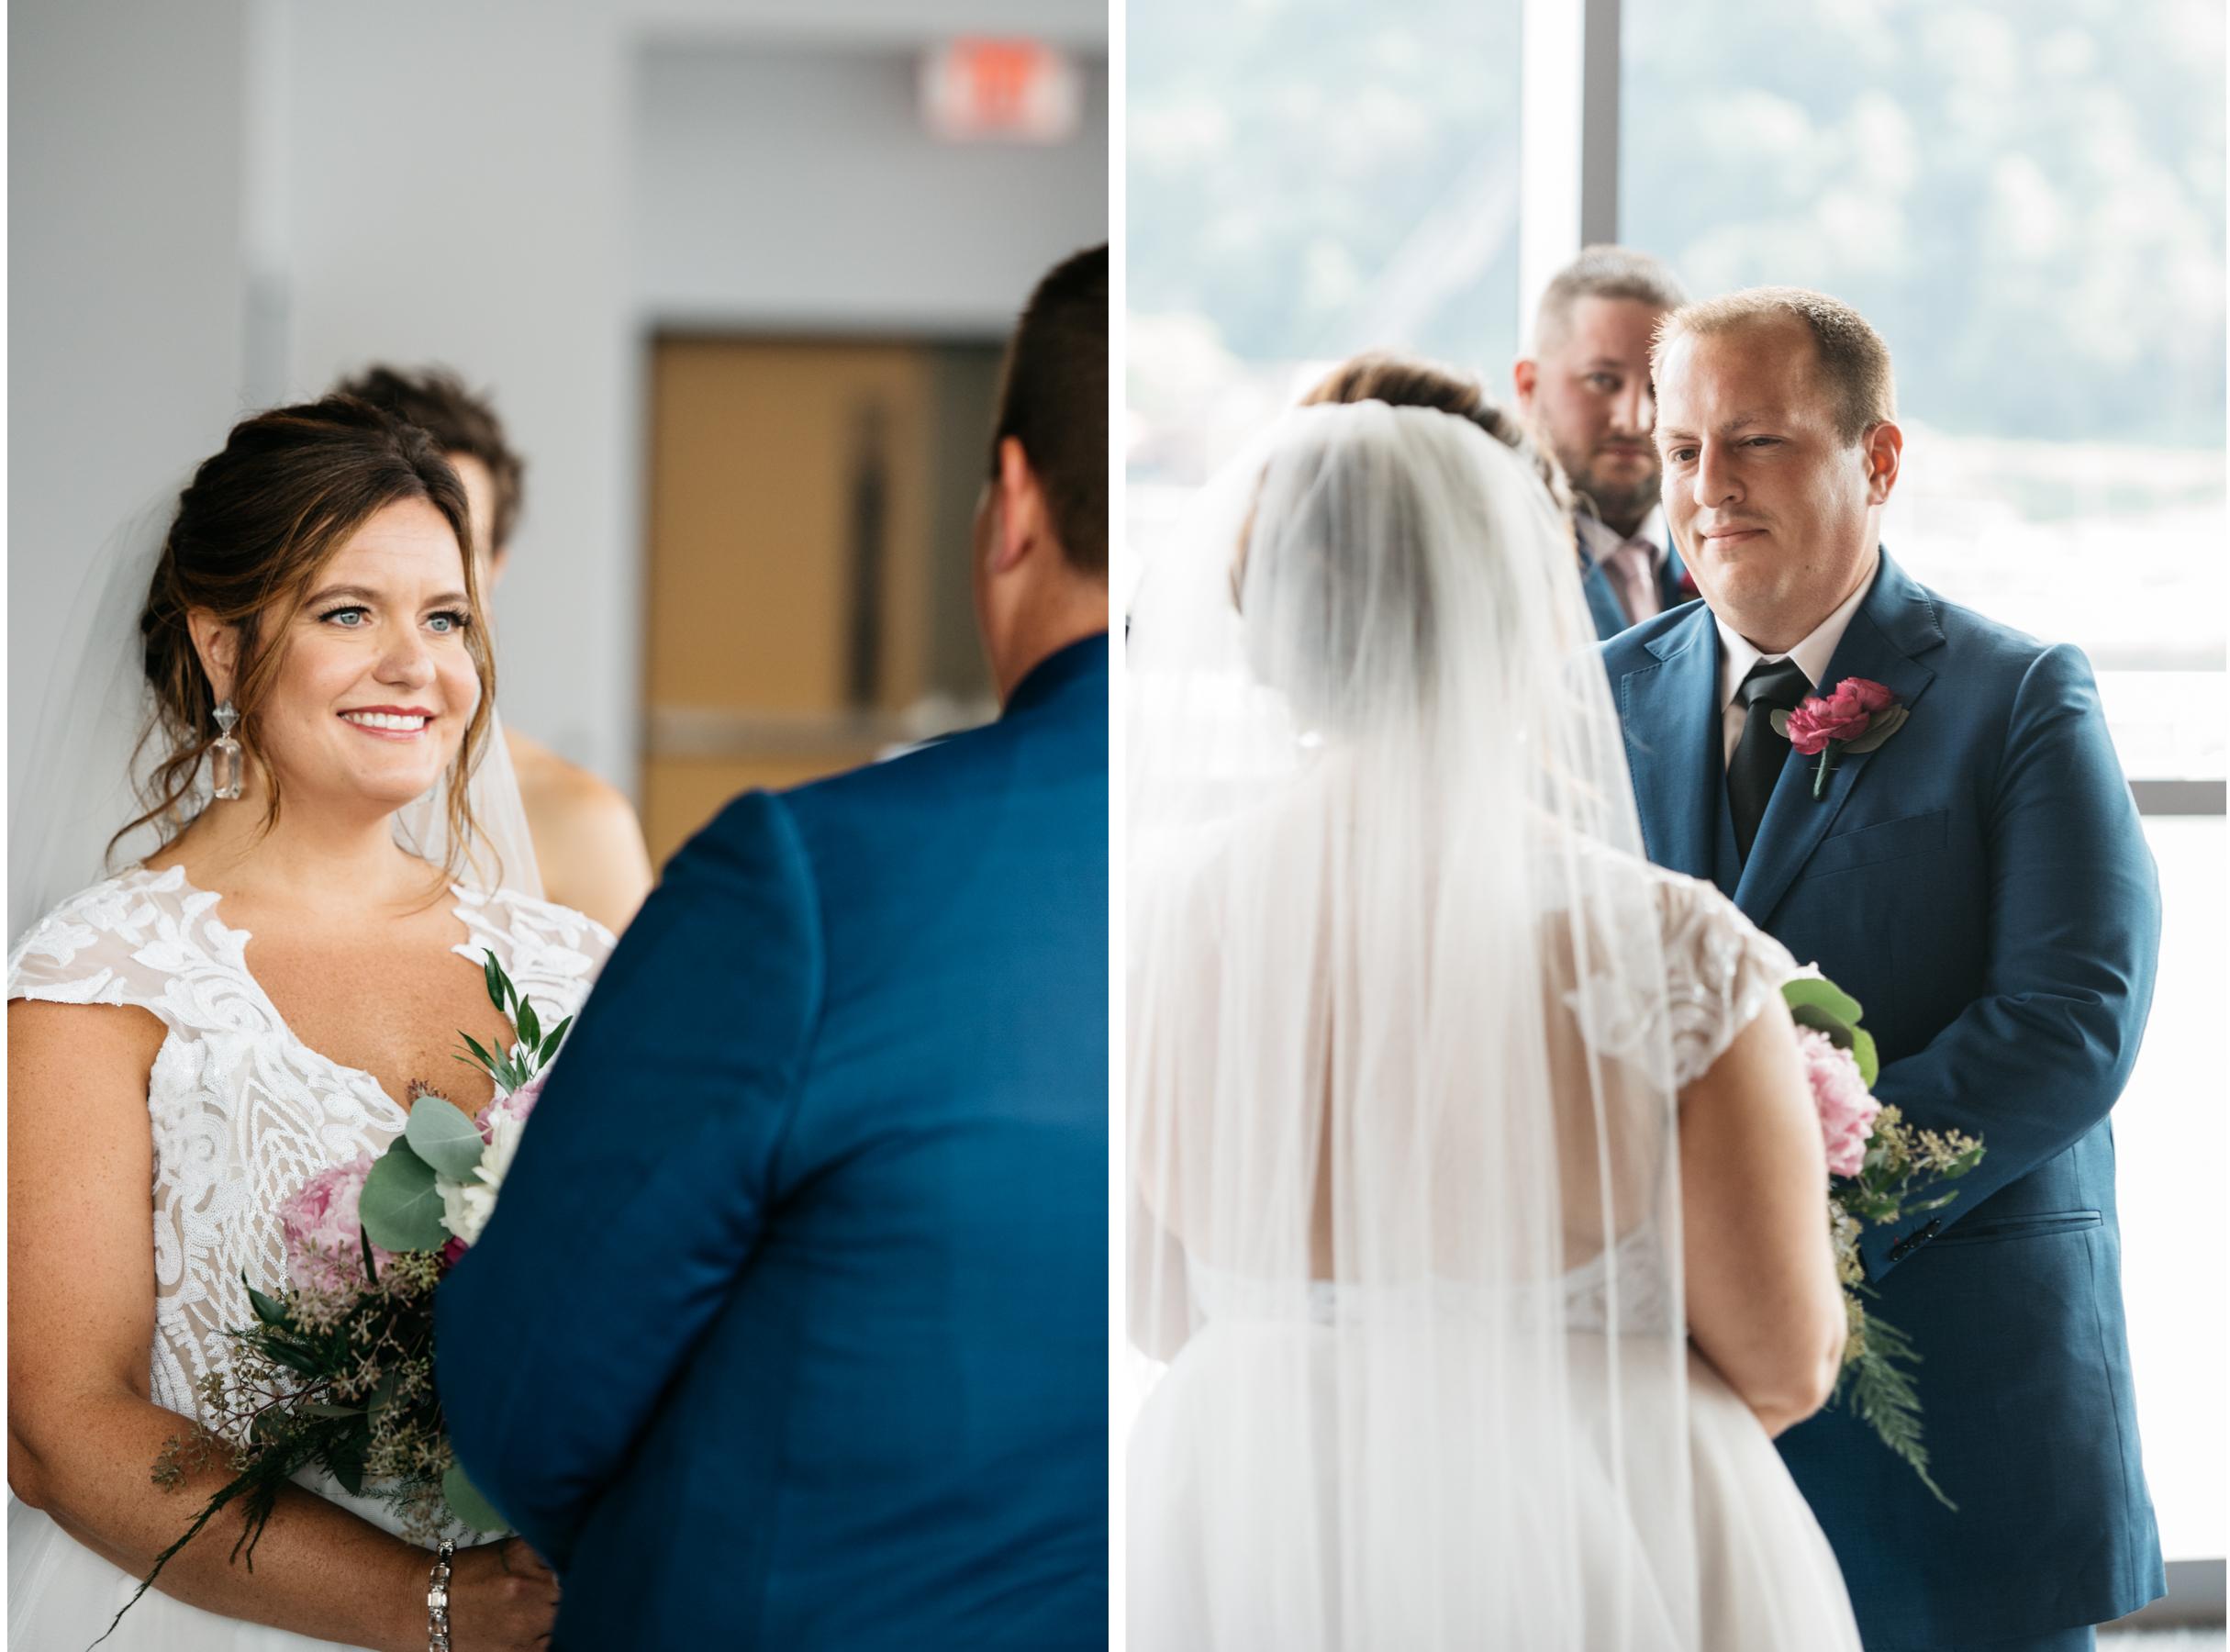 Pointview Hall, Carnegie Science Center, Mariah Fisher, Pittsburgh Wedding Photographer.jpg